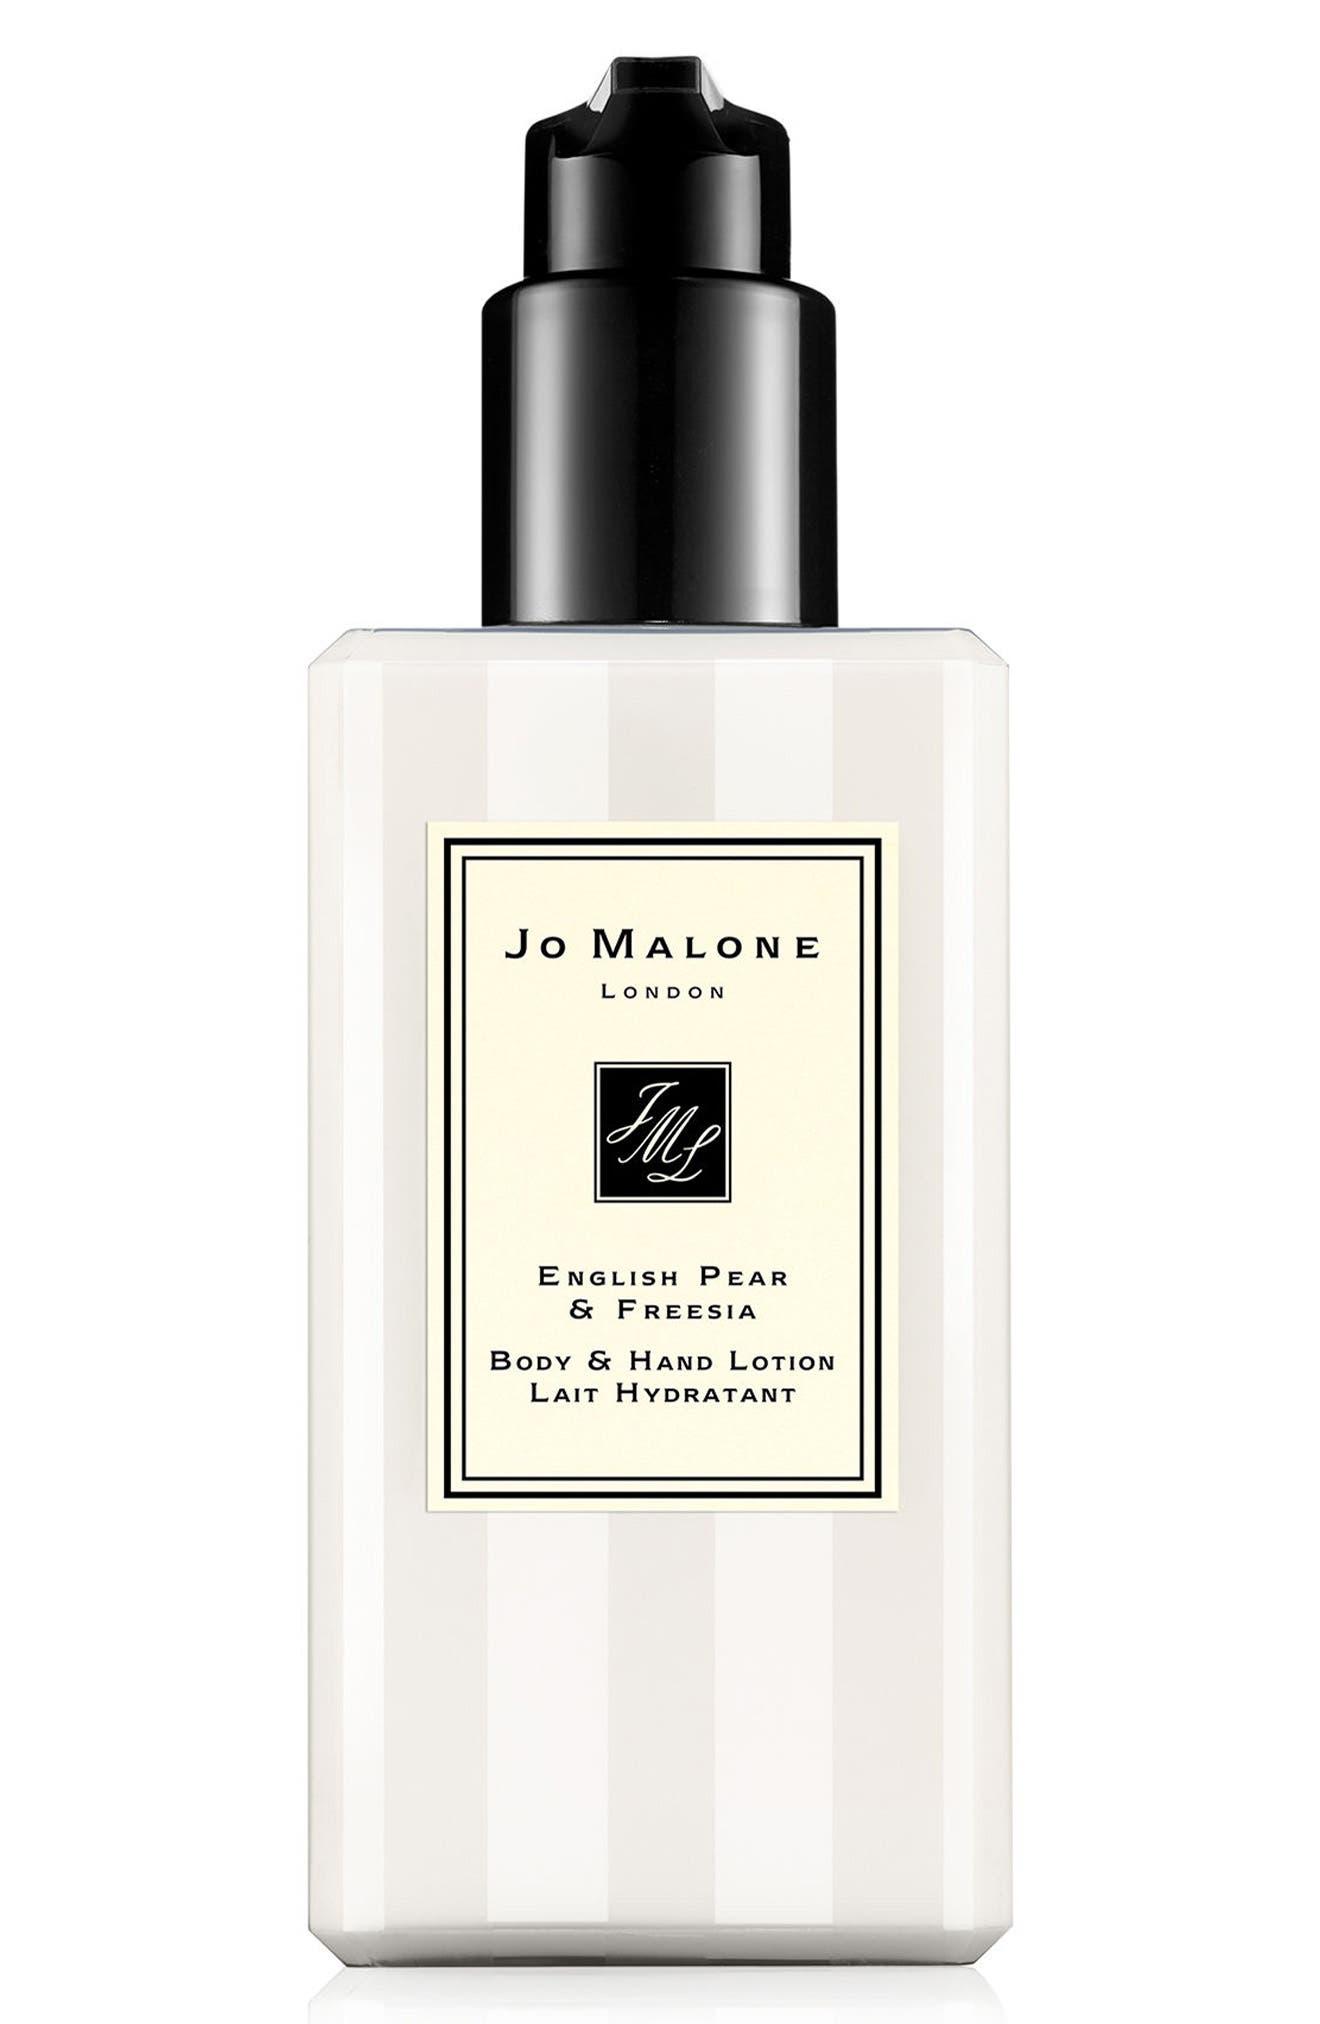 Jo Malone London(TM) English Pear & Freesia Body & Hand Lotion